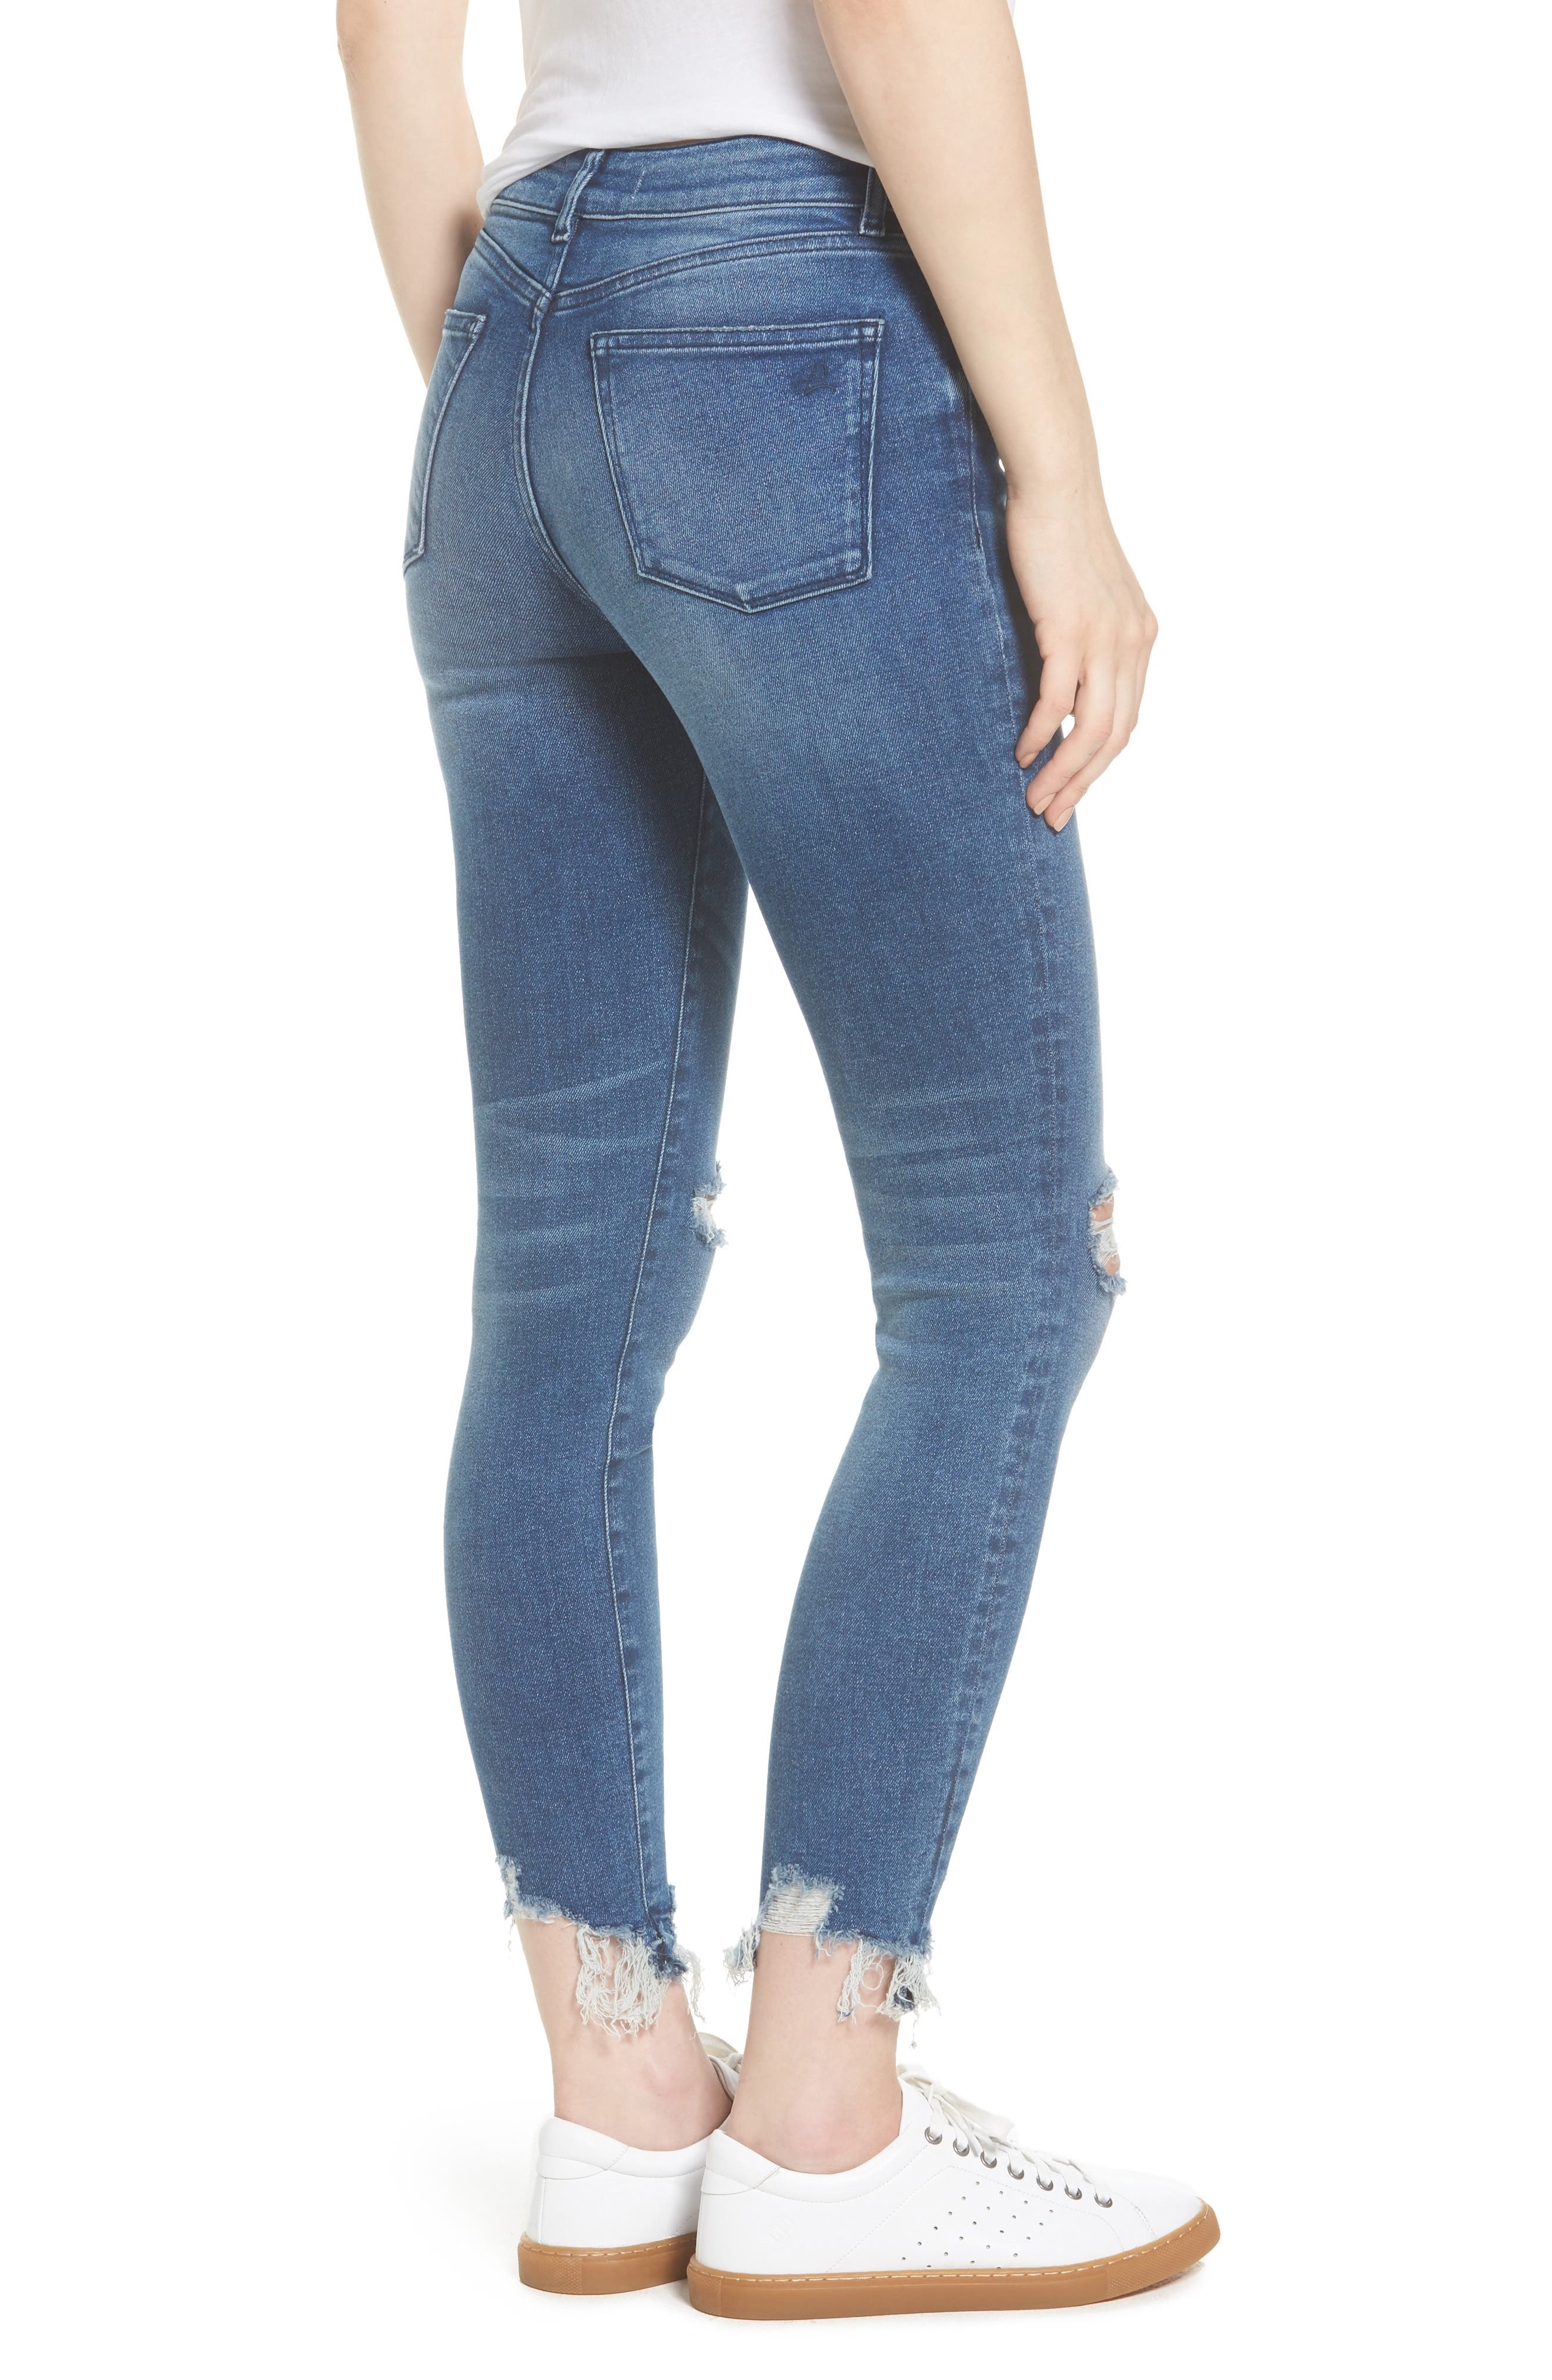 Farrow Instaslim High Waist Ankle Skinny Jeans,                             Alternate thumbnail 2, color,                             430